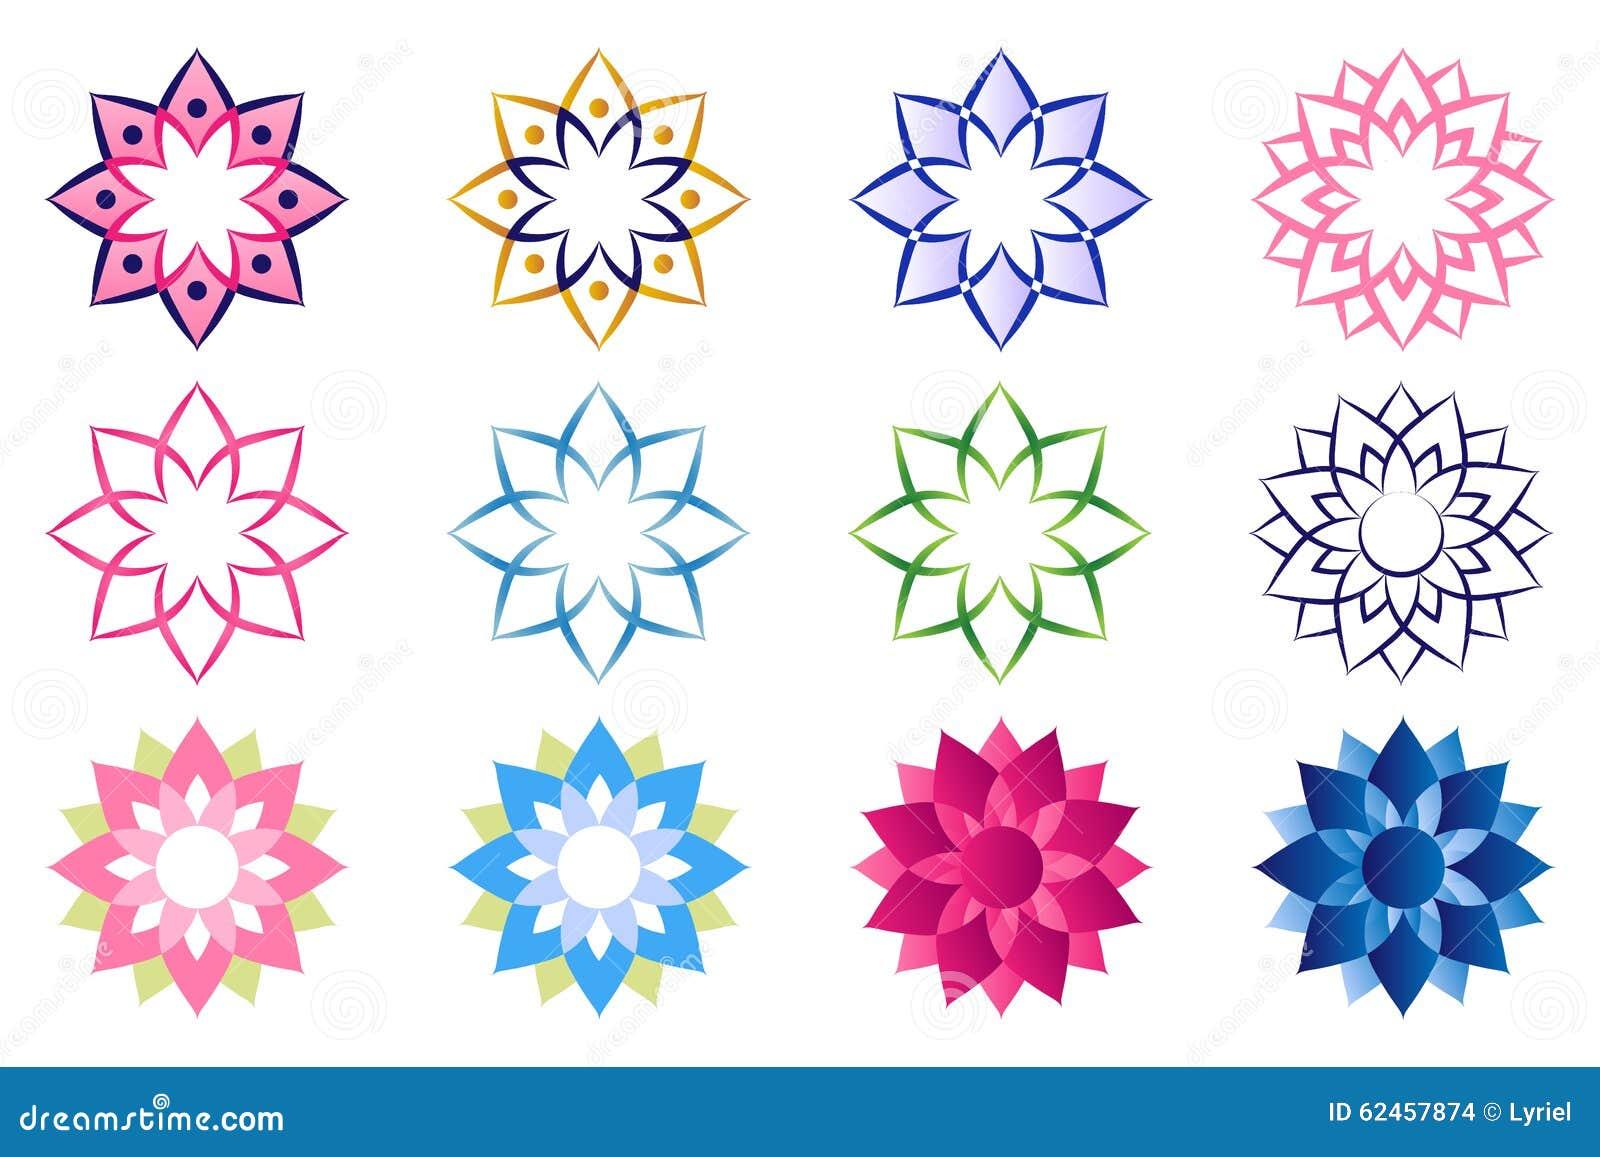 lotus flower logo stock illustration image 62457874